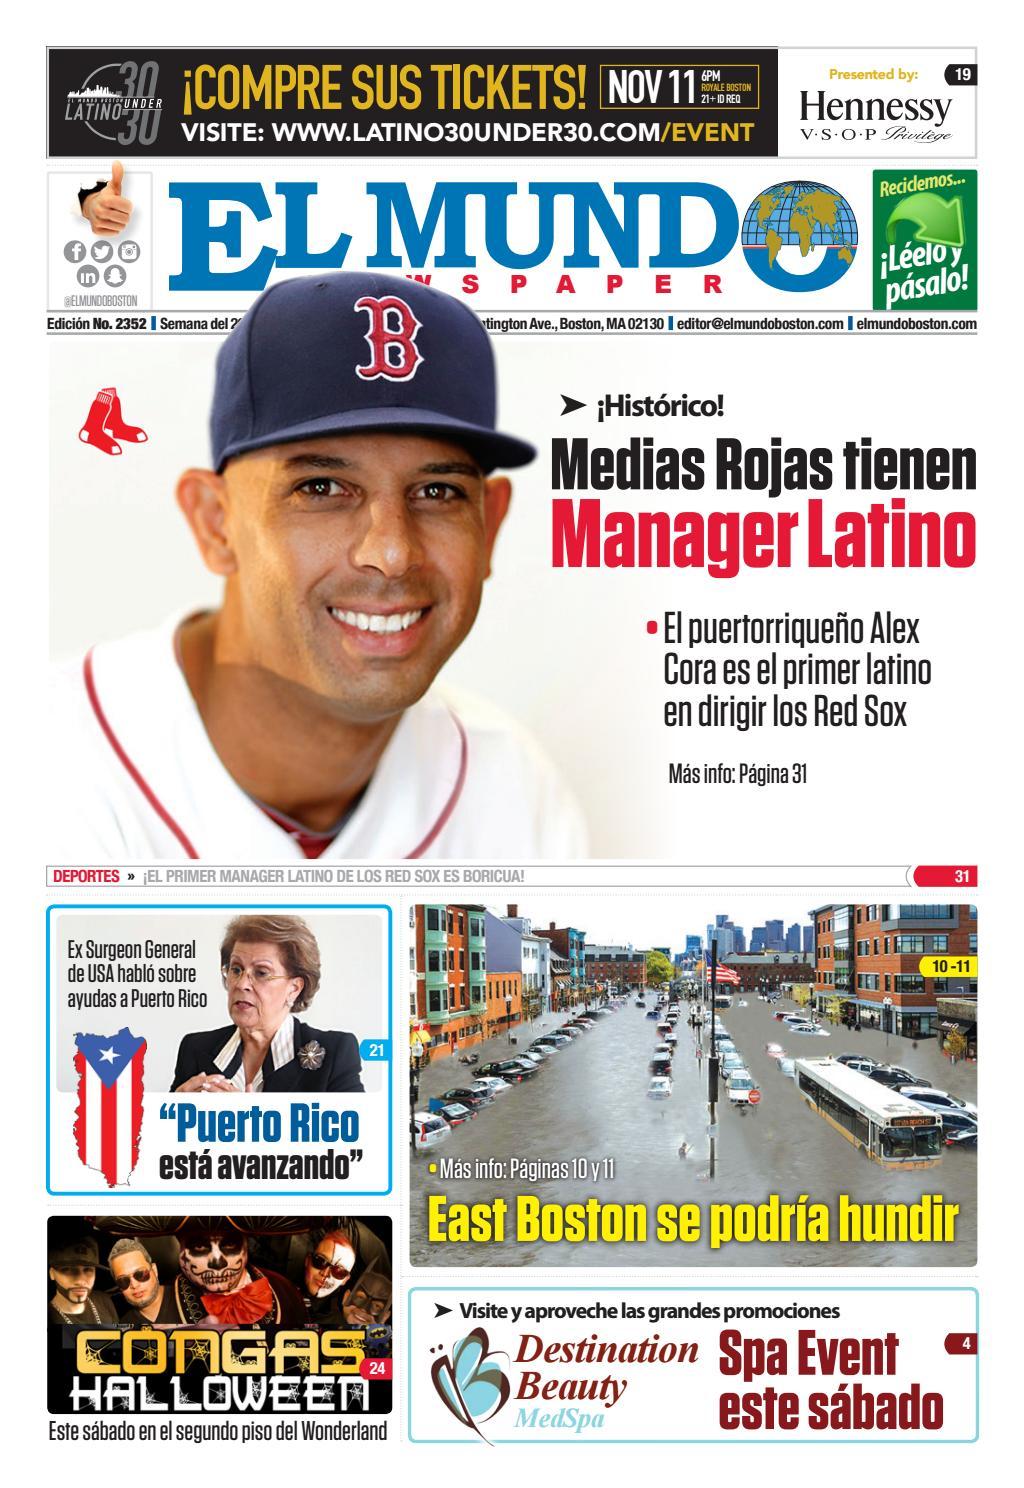 El Mundo Boston | Newspaper | Oct 26, 2017 by El Mundo Boston ...